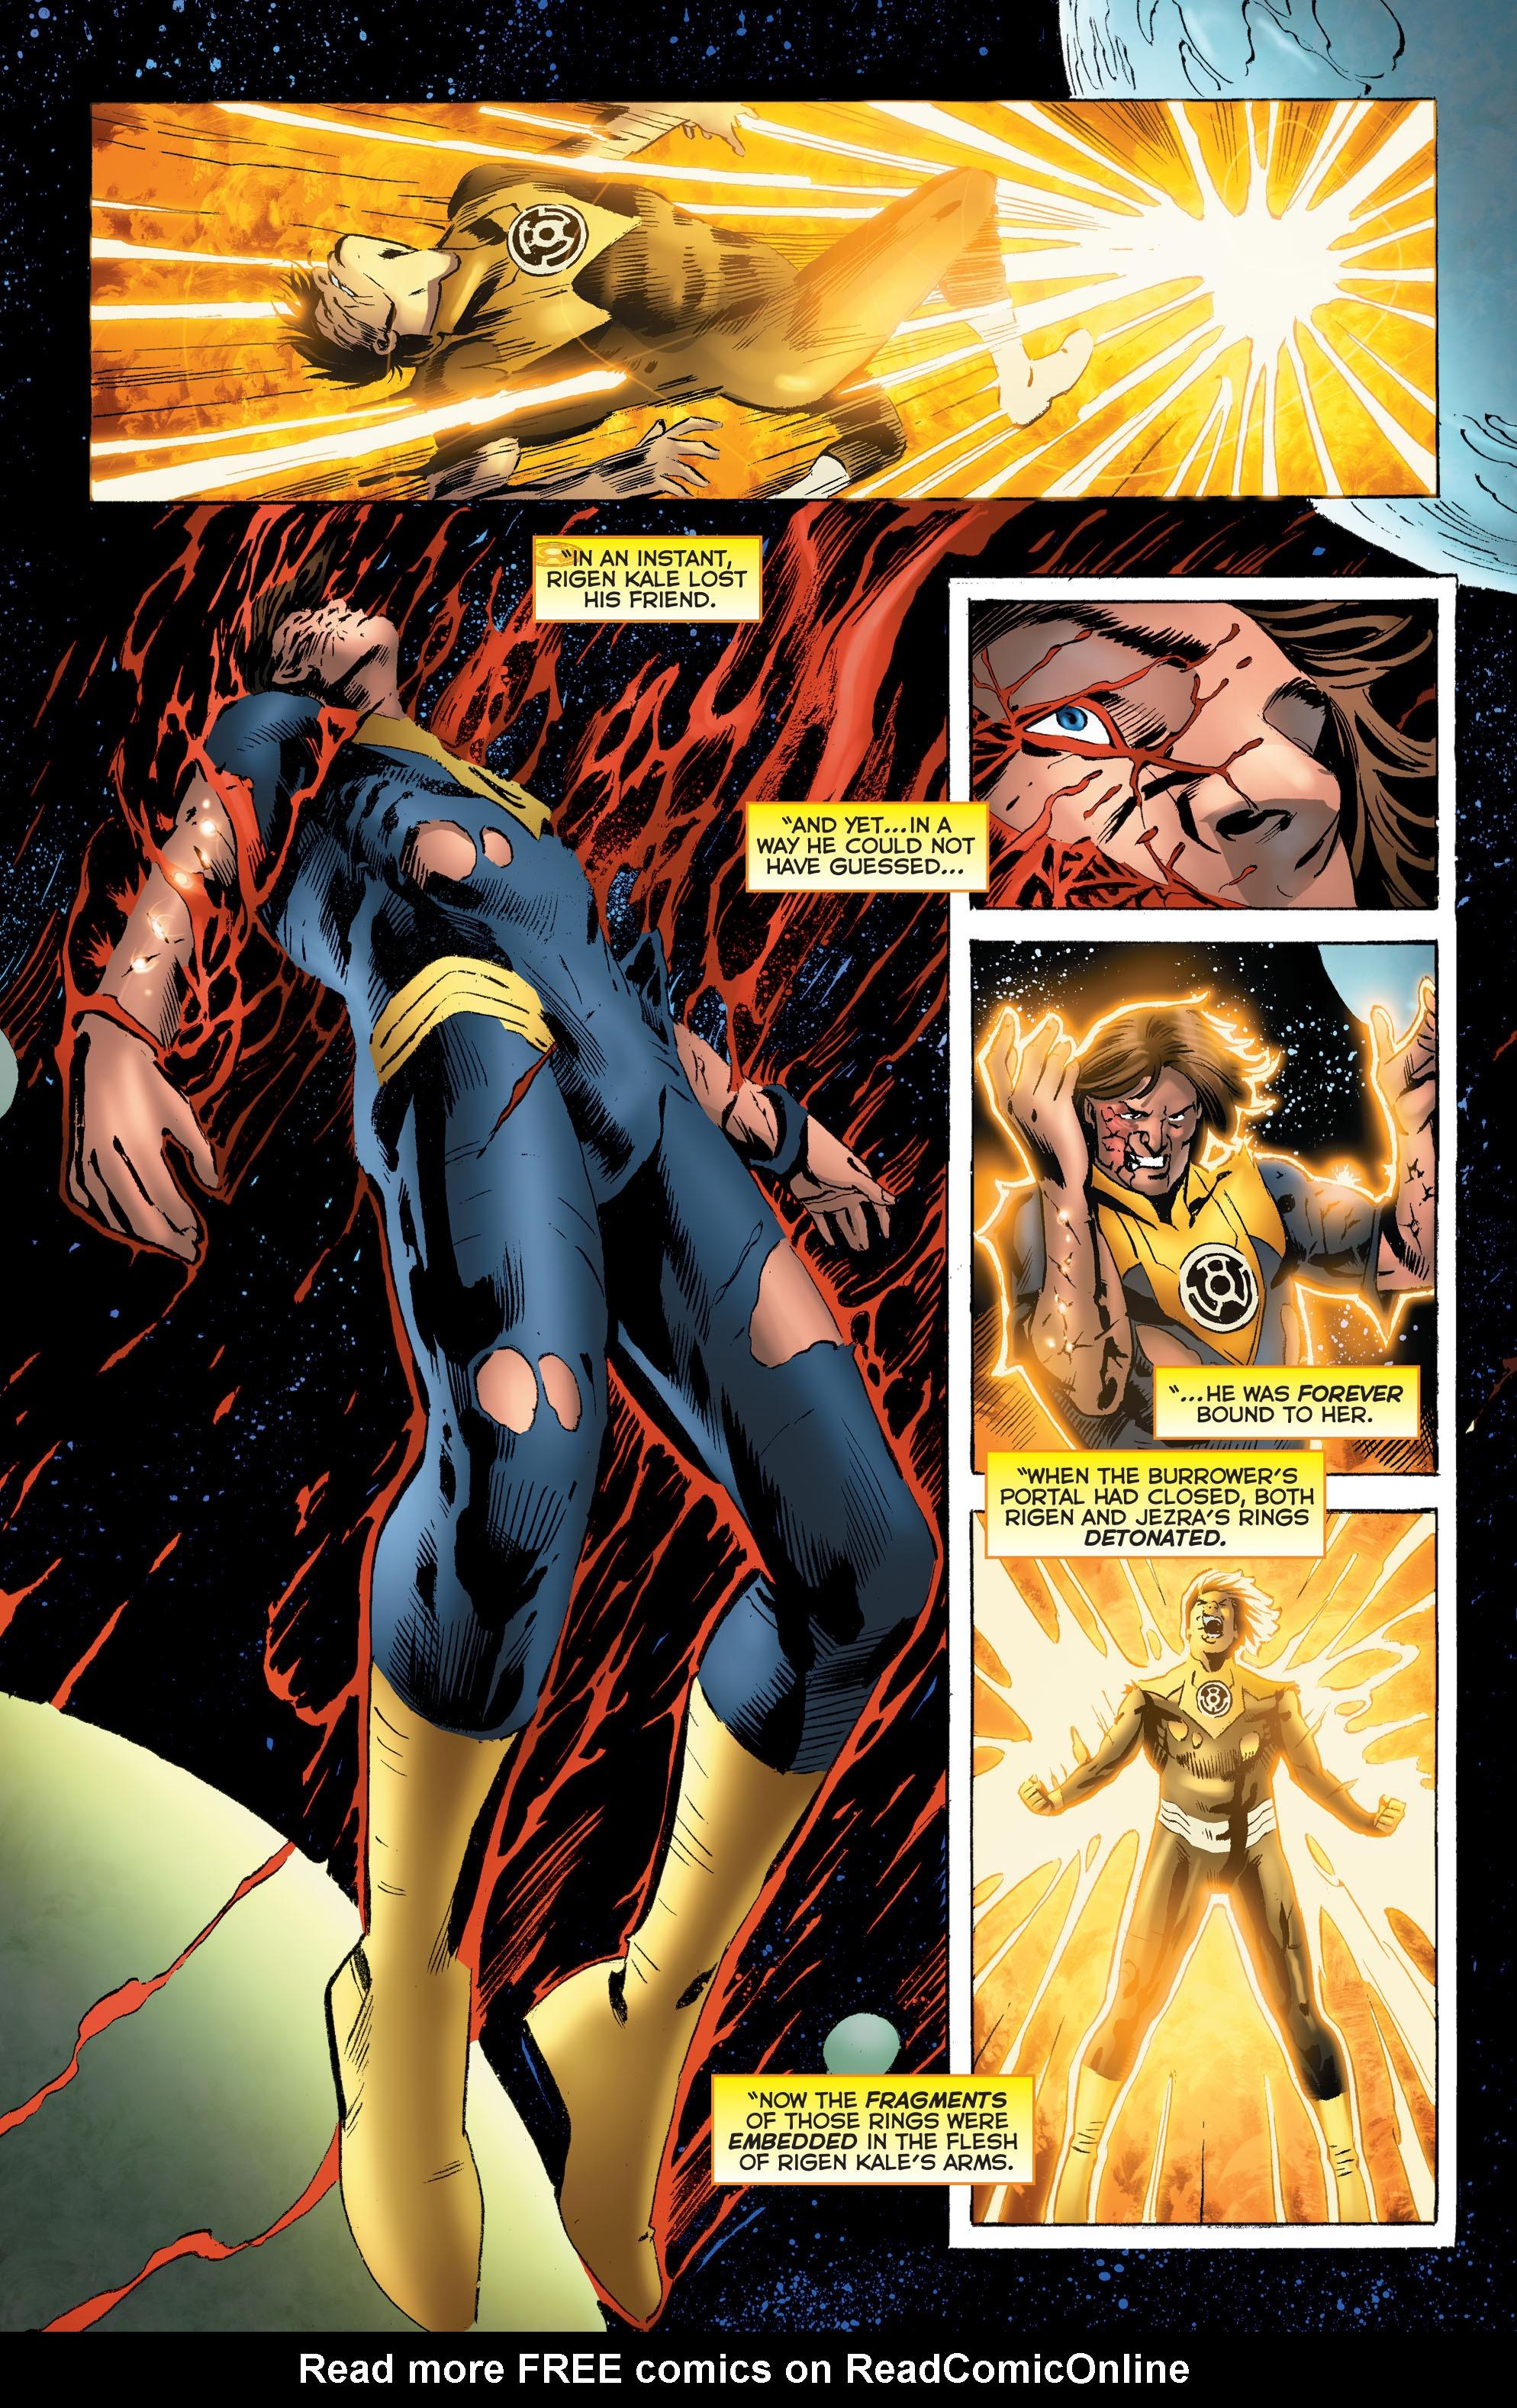 Read online Sinestro comic -  Issue # Annual 1 - 29